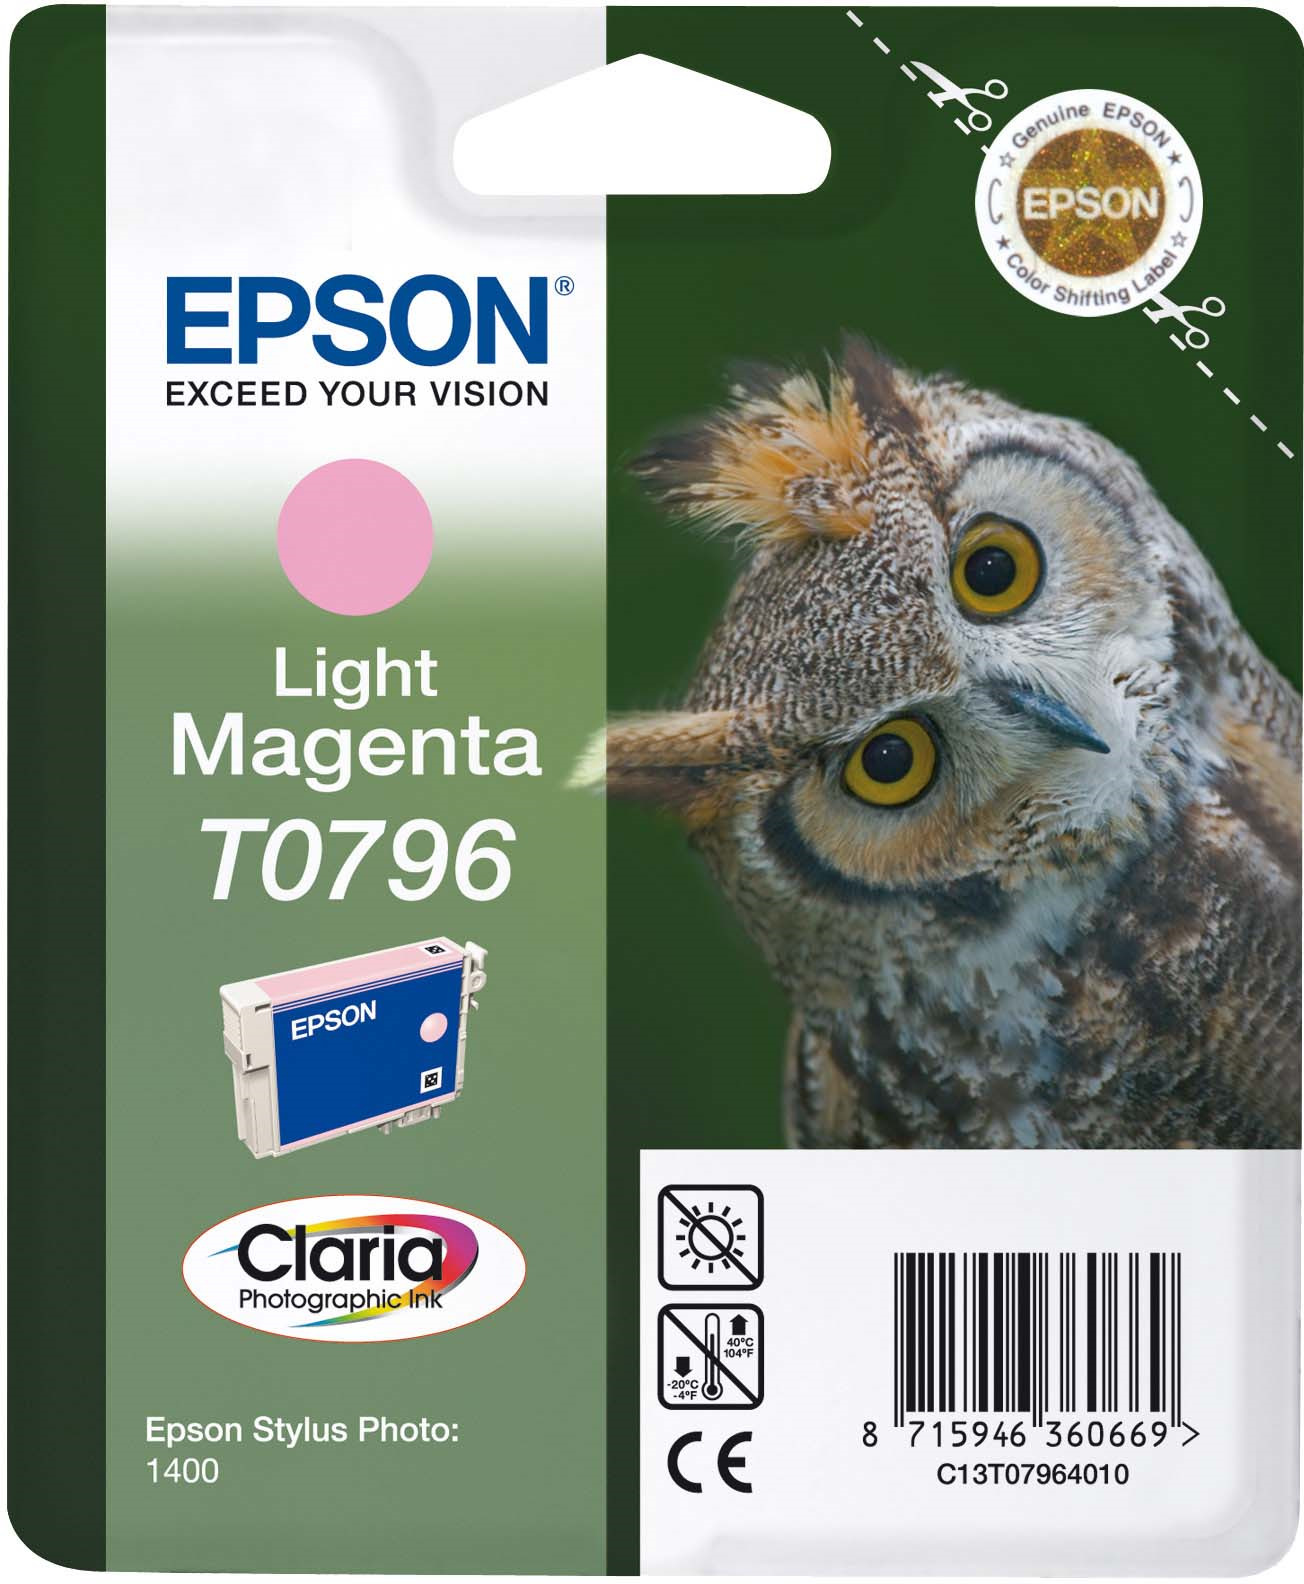 Картридж Epson C13T07964010 Light Magenta для принтеров Epson Stylus Photo 1500W, светло-пурпурный картридж original epson [t034340] для epson stylus photo 2100 magenta